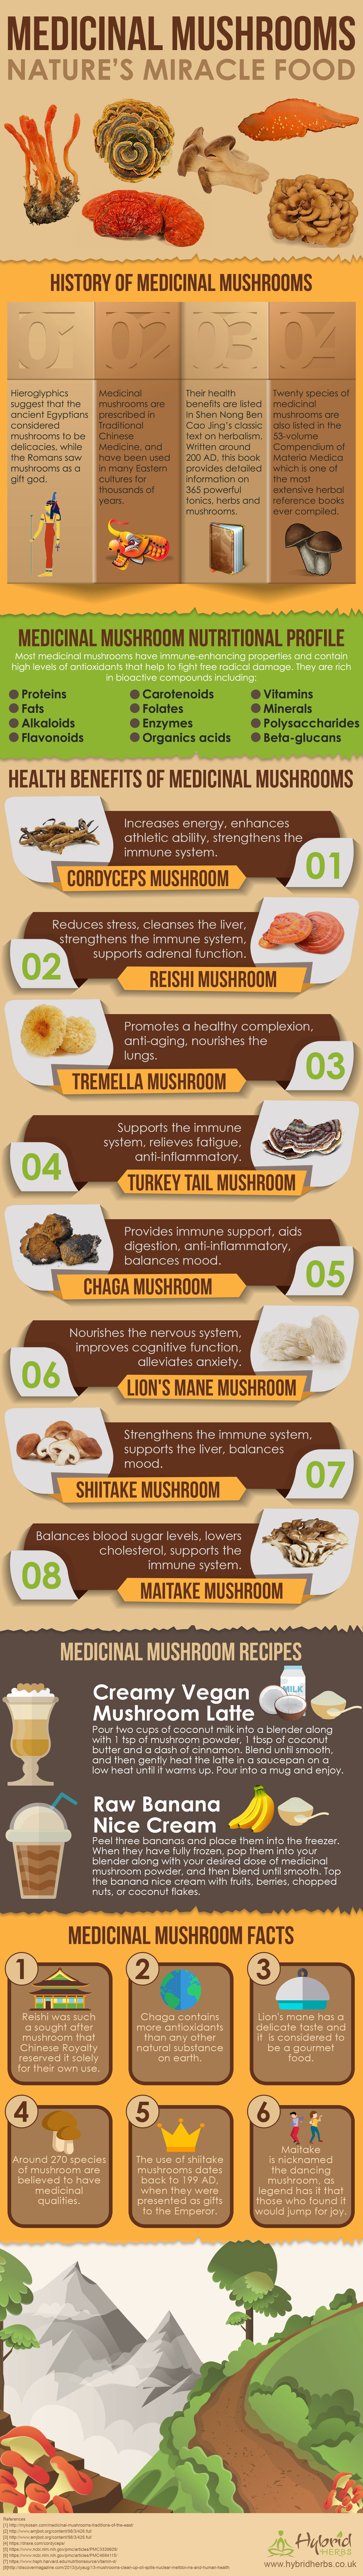 medicinal-mushroom-health-benefits.jpg